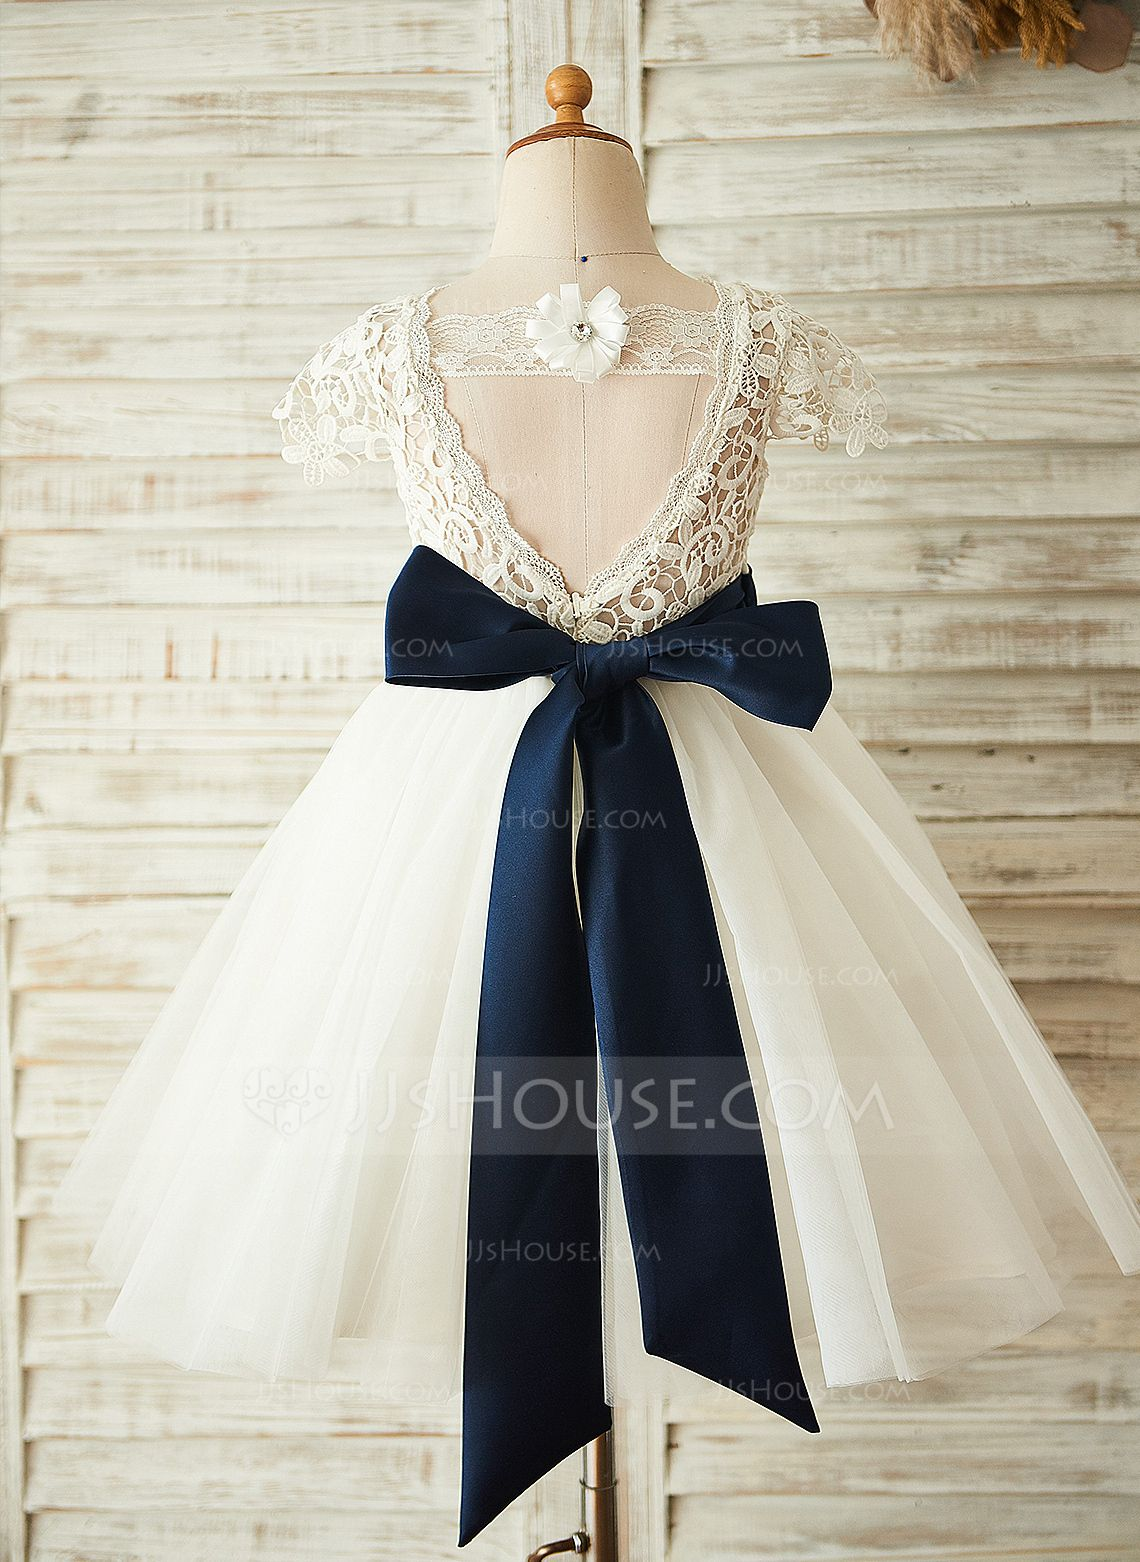 44e87e52c34 A-Line Princess Knee-length Flower Girl Dress - Tulle Lace Sleeveless Scoop  Neck With Sash Flower(s) Back Hole (010104926) - JJsHouse